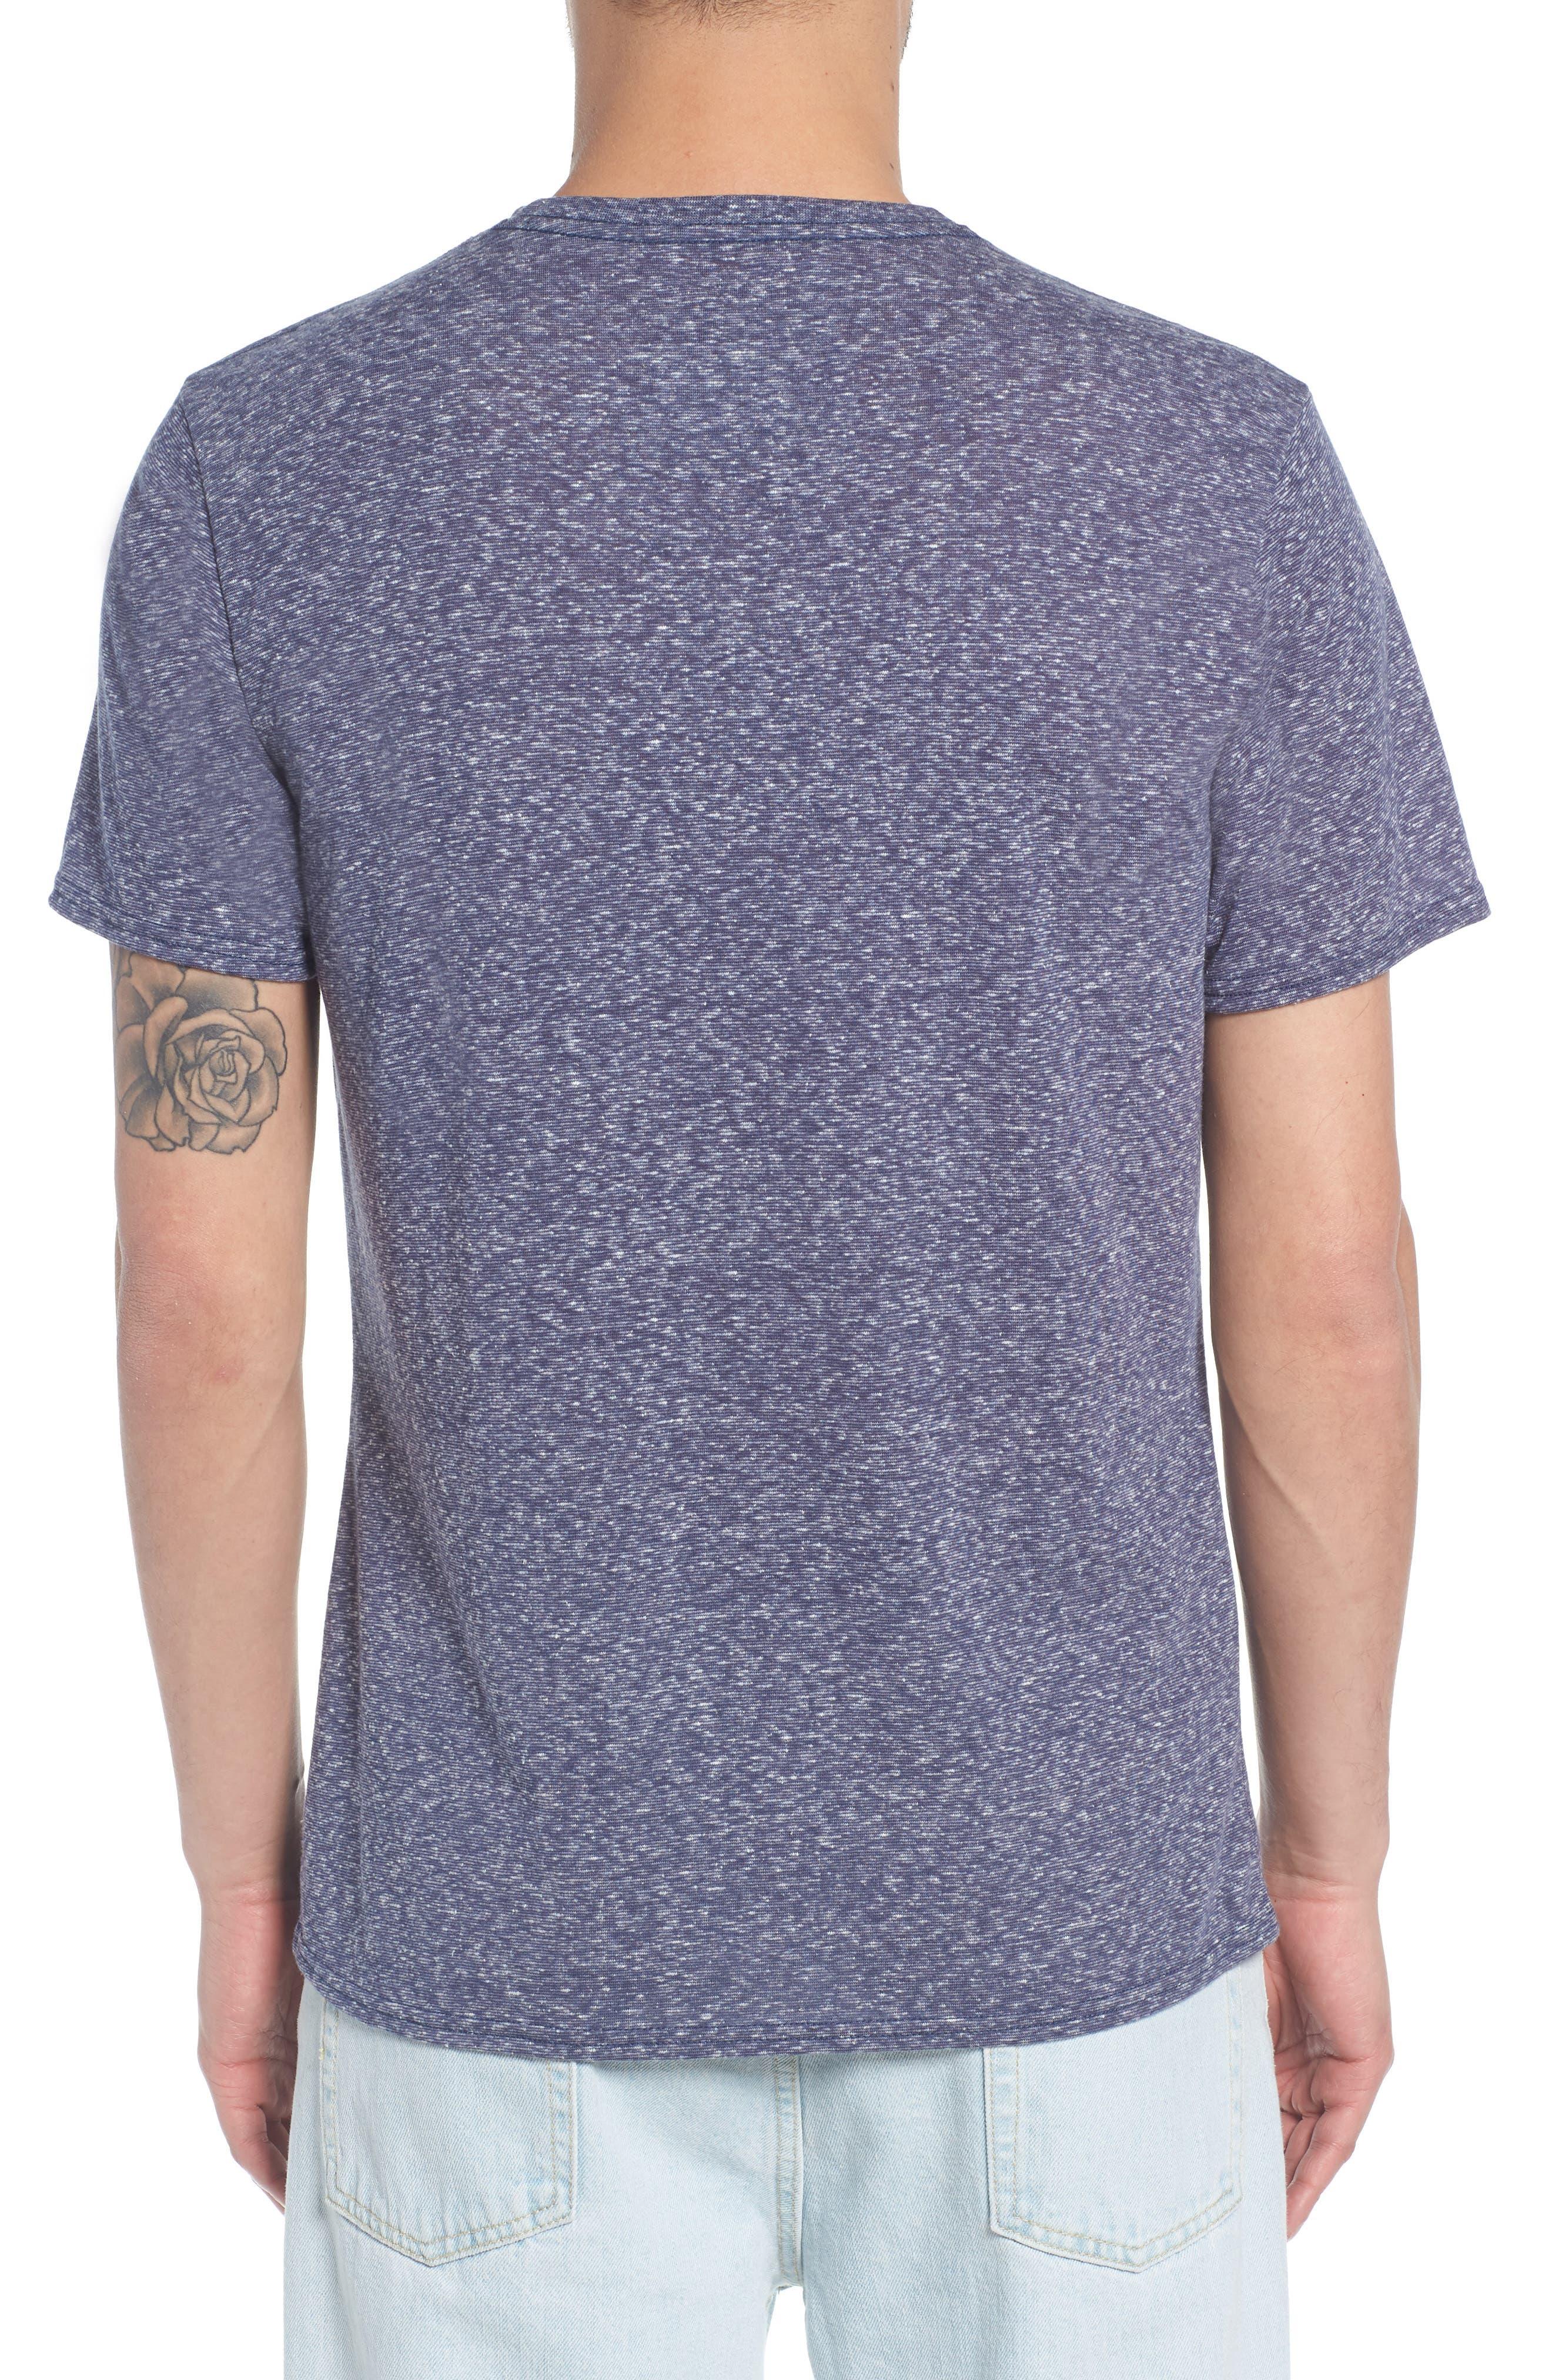 Jersey V-Neck T-Shirt,                             Alternate thumbnail 2, color,                             410